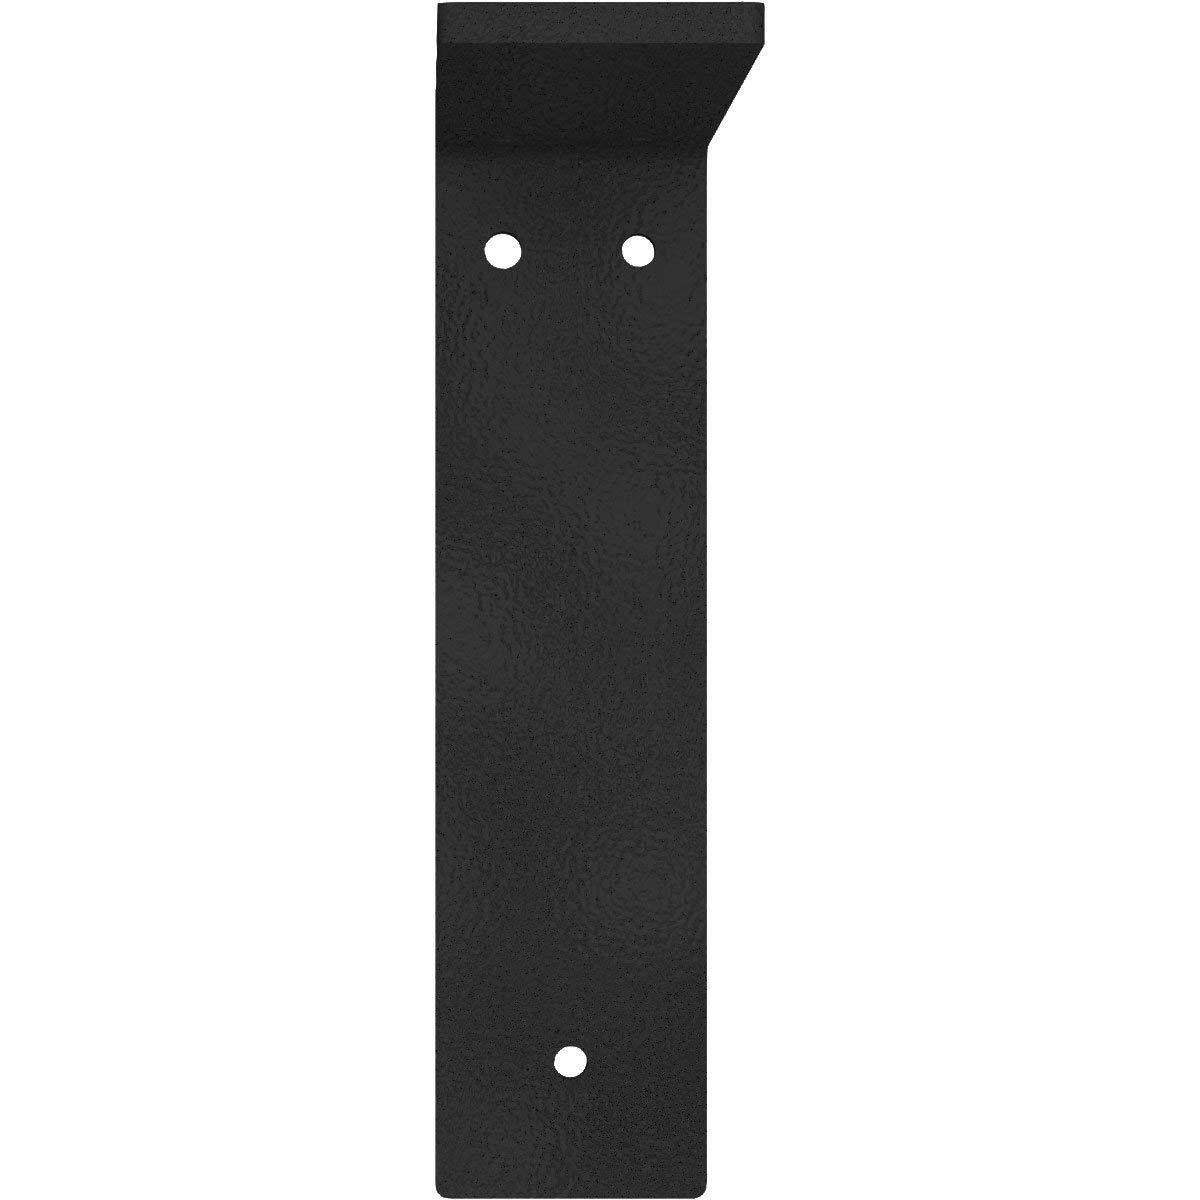 Ekena Millwork BKTM02X08X08HAHBL 2 W D x 8 H Hamilton Steel Bracket Hammered Black Renewed 2 Wx 8 Dx 8